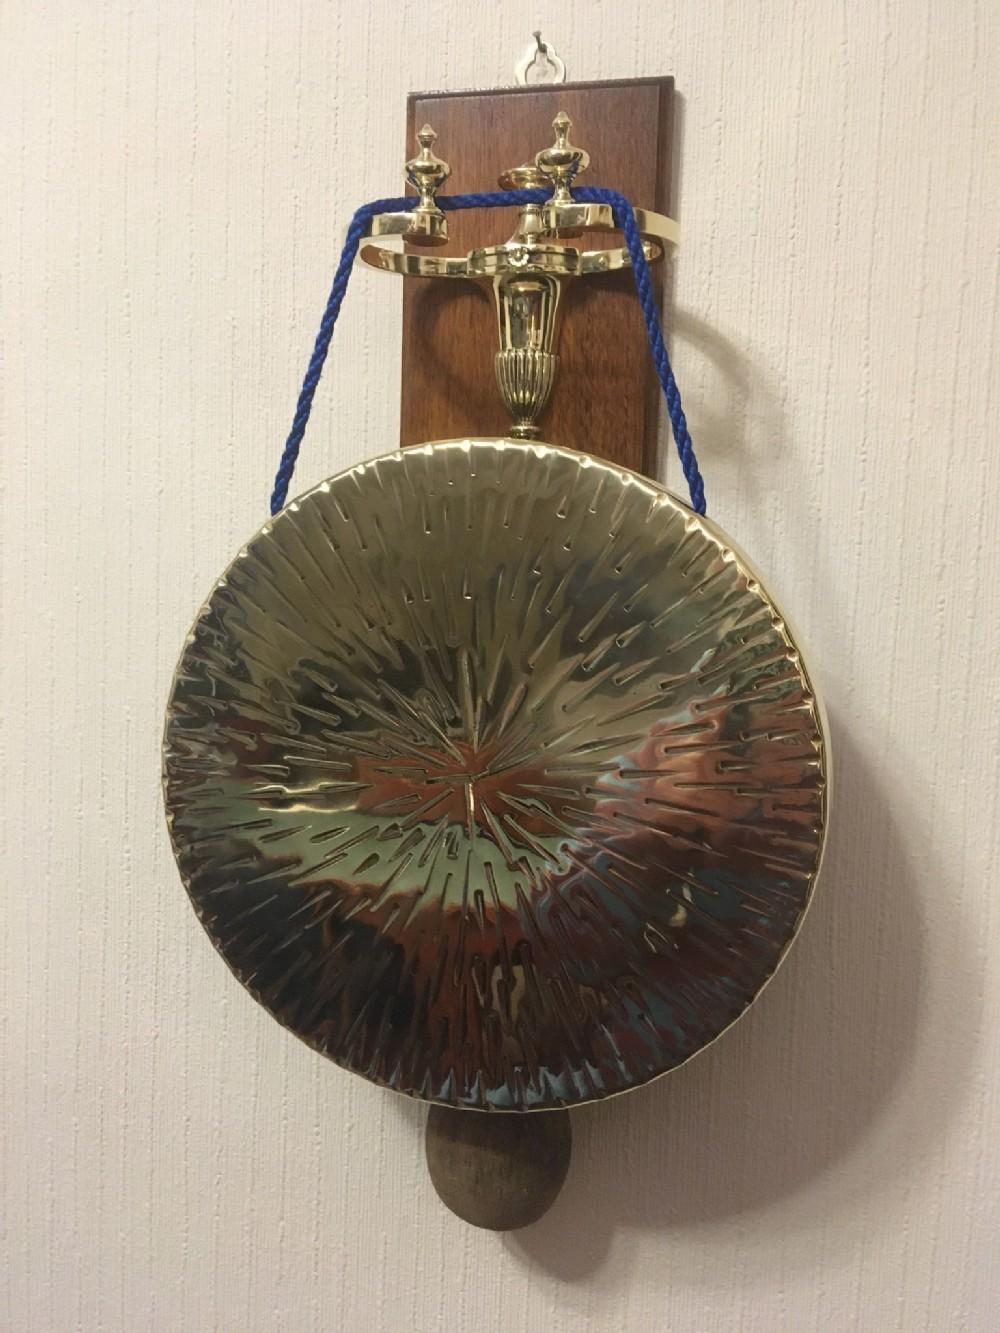 w tonks wall mounted gong